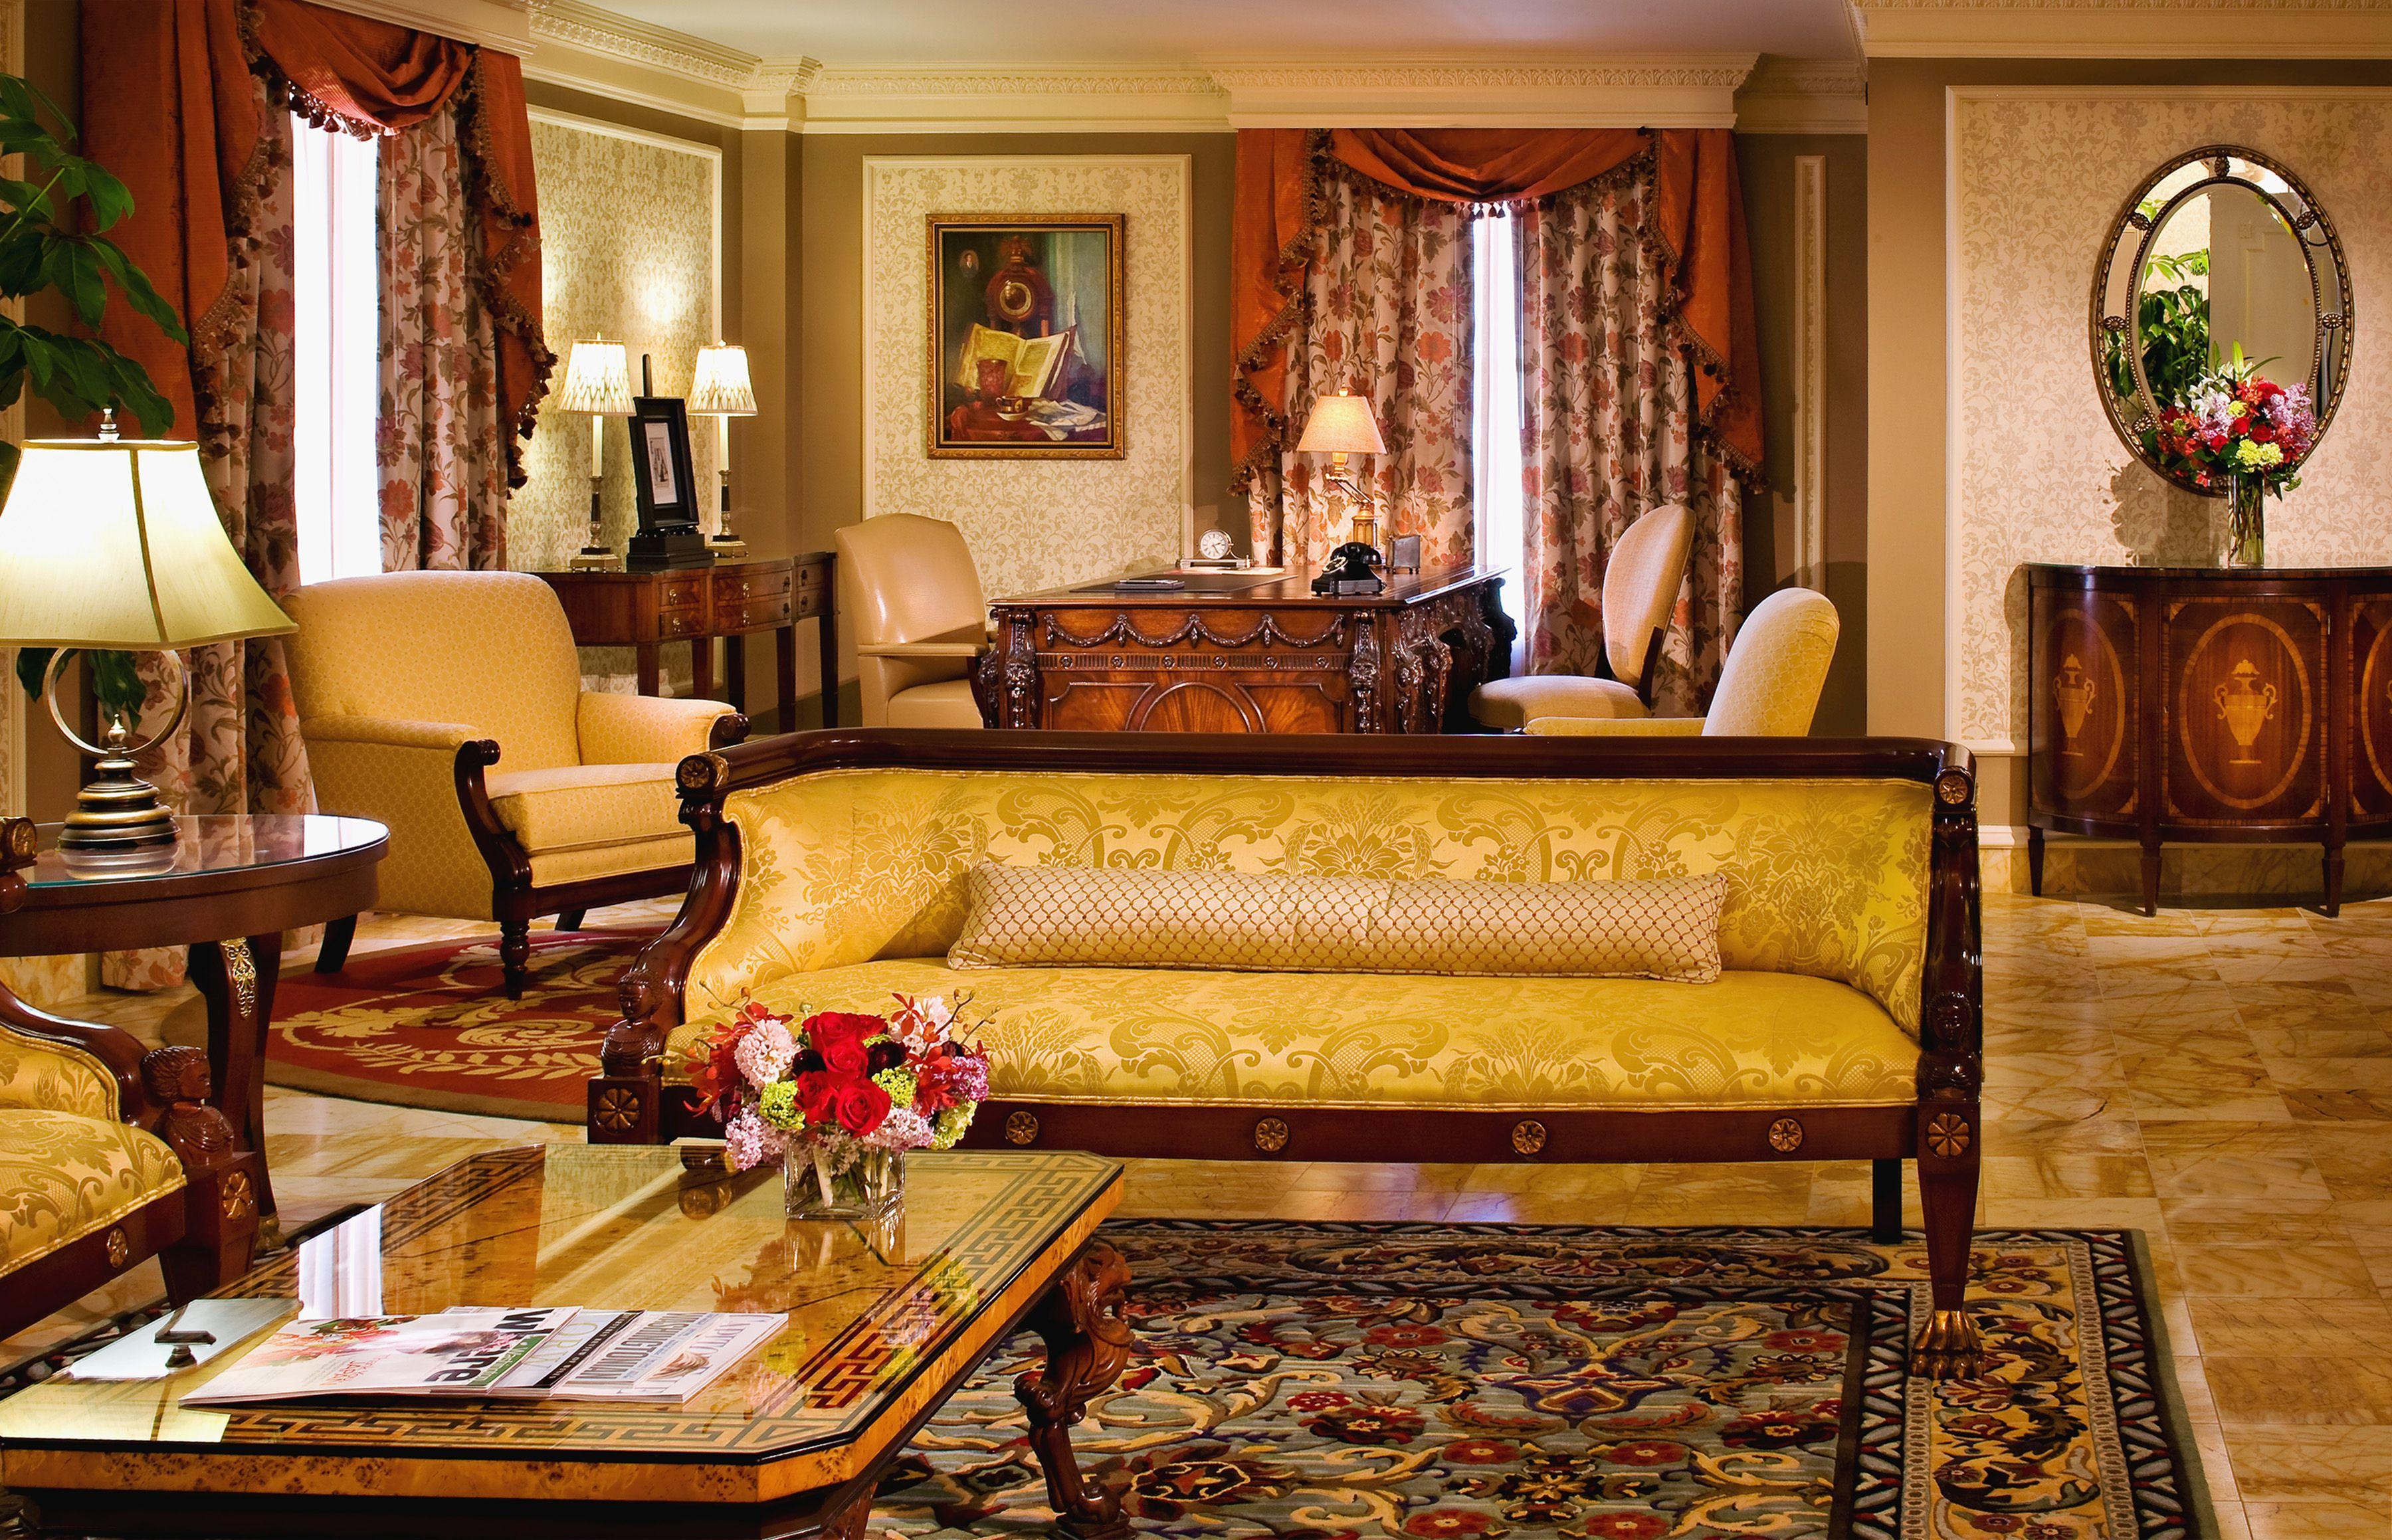 10 best presidential hotel suites in washington dc - Washington dc suites hotels 2 bedroom ...